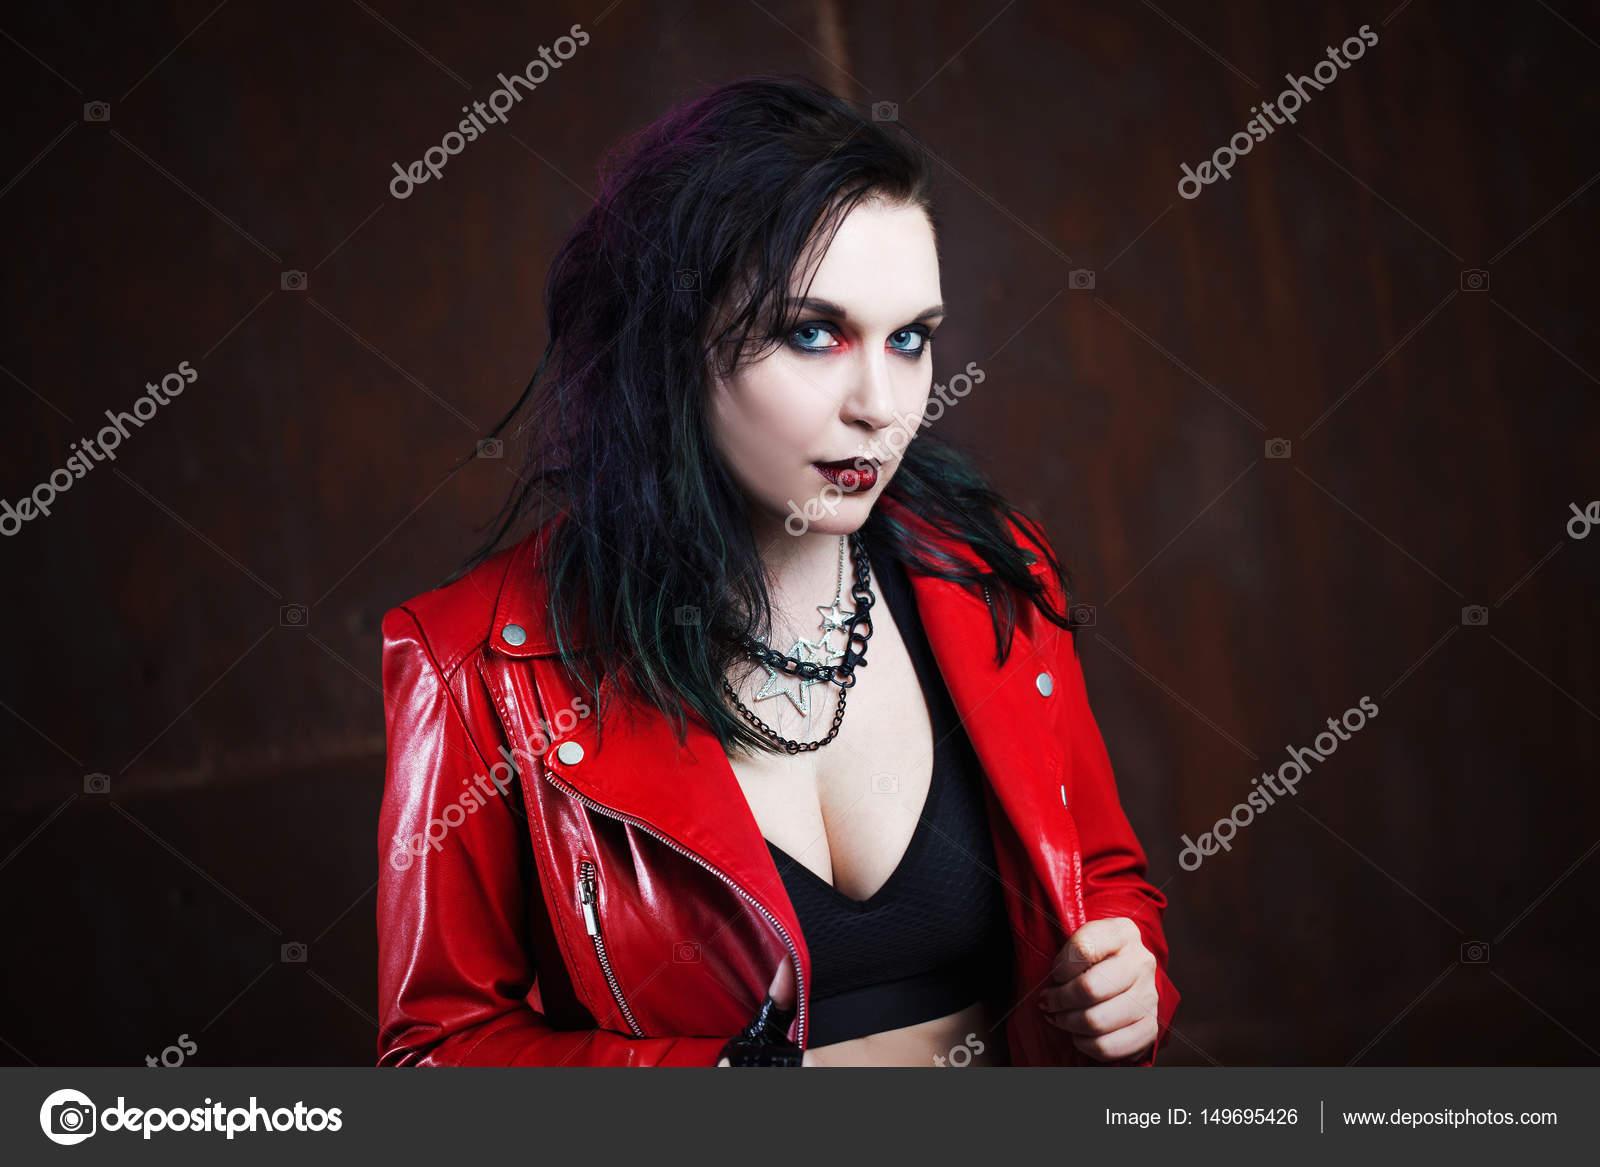 6db2b8ecf5da ... με κόκκινο δερμάτινο μπουφάν — Φωτογραφία Αρχείου · Επιθετικό πανκ  γυναίκα απεργία κάποιος με ένα ρόπαλο — Εικόνα από ...